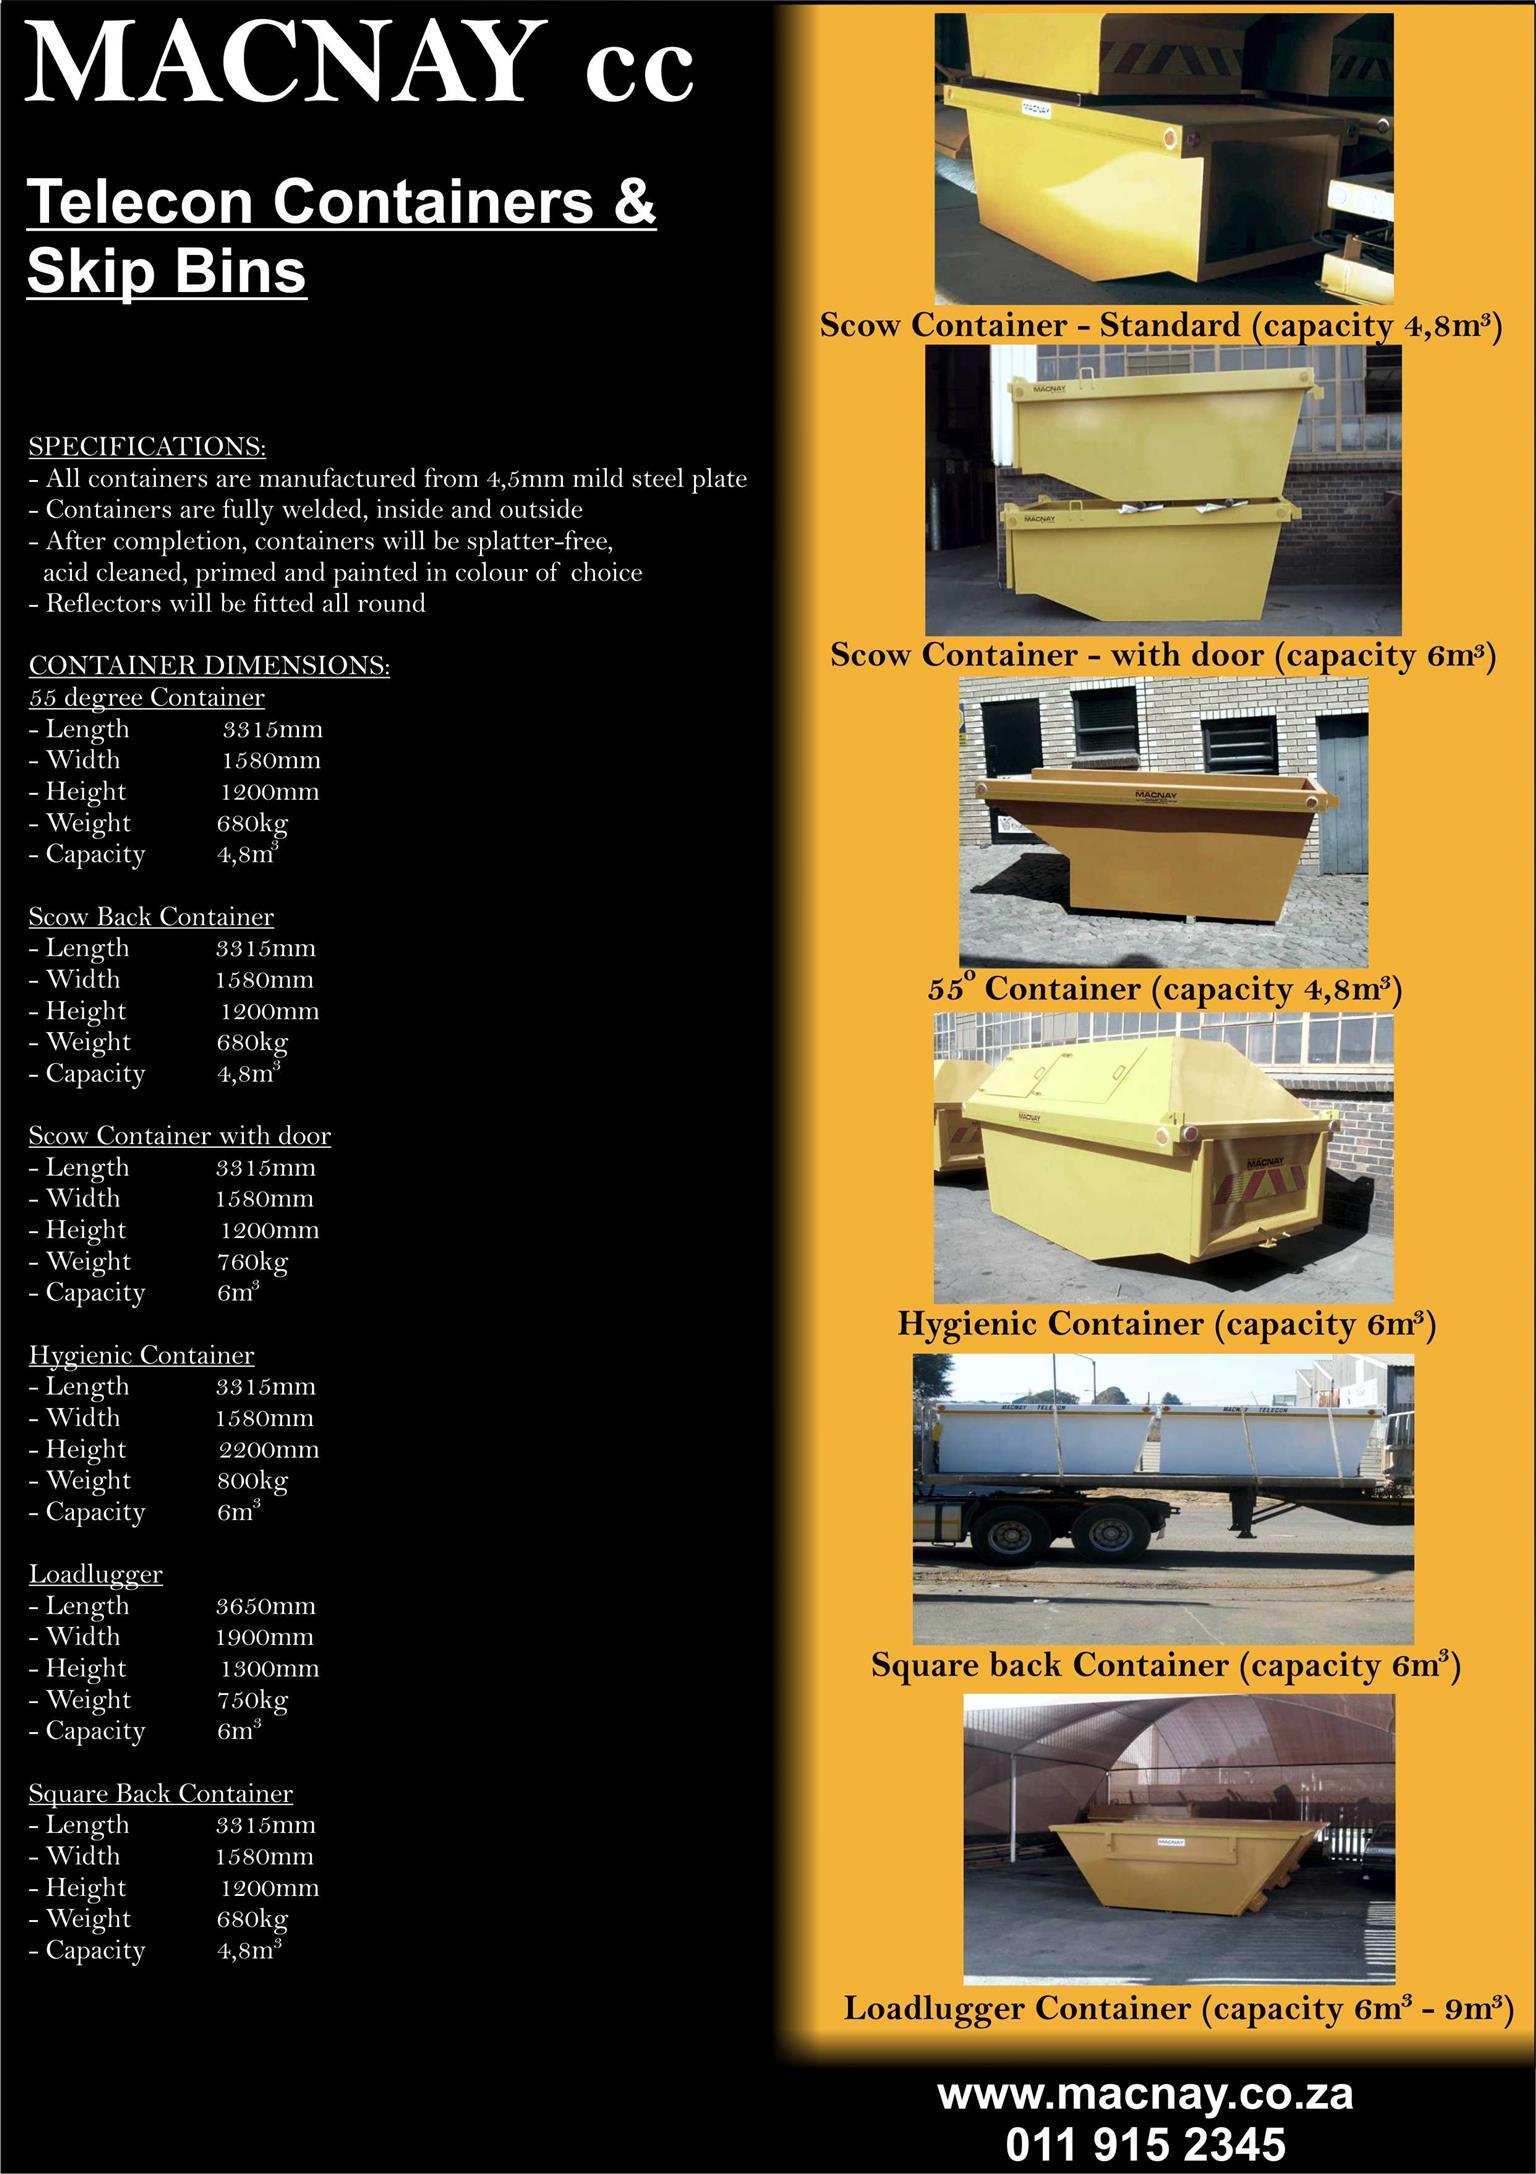 MACNAY Telecon & Skip Container